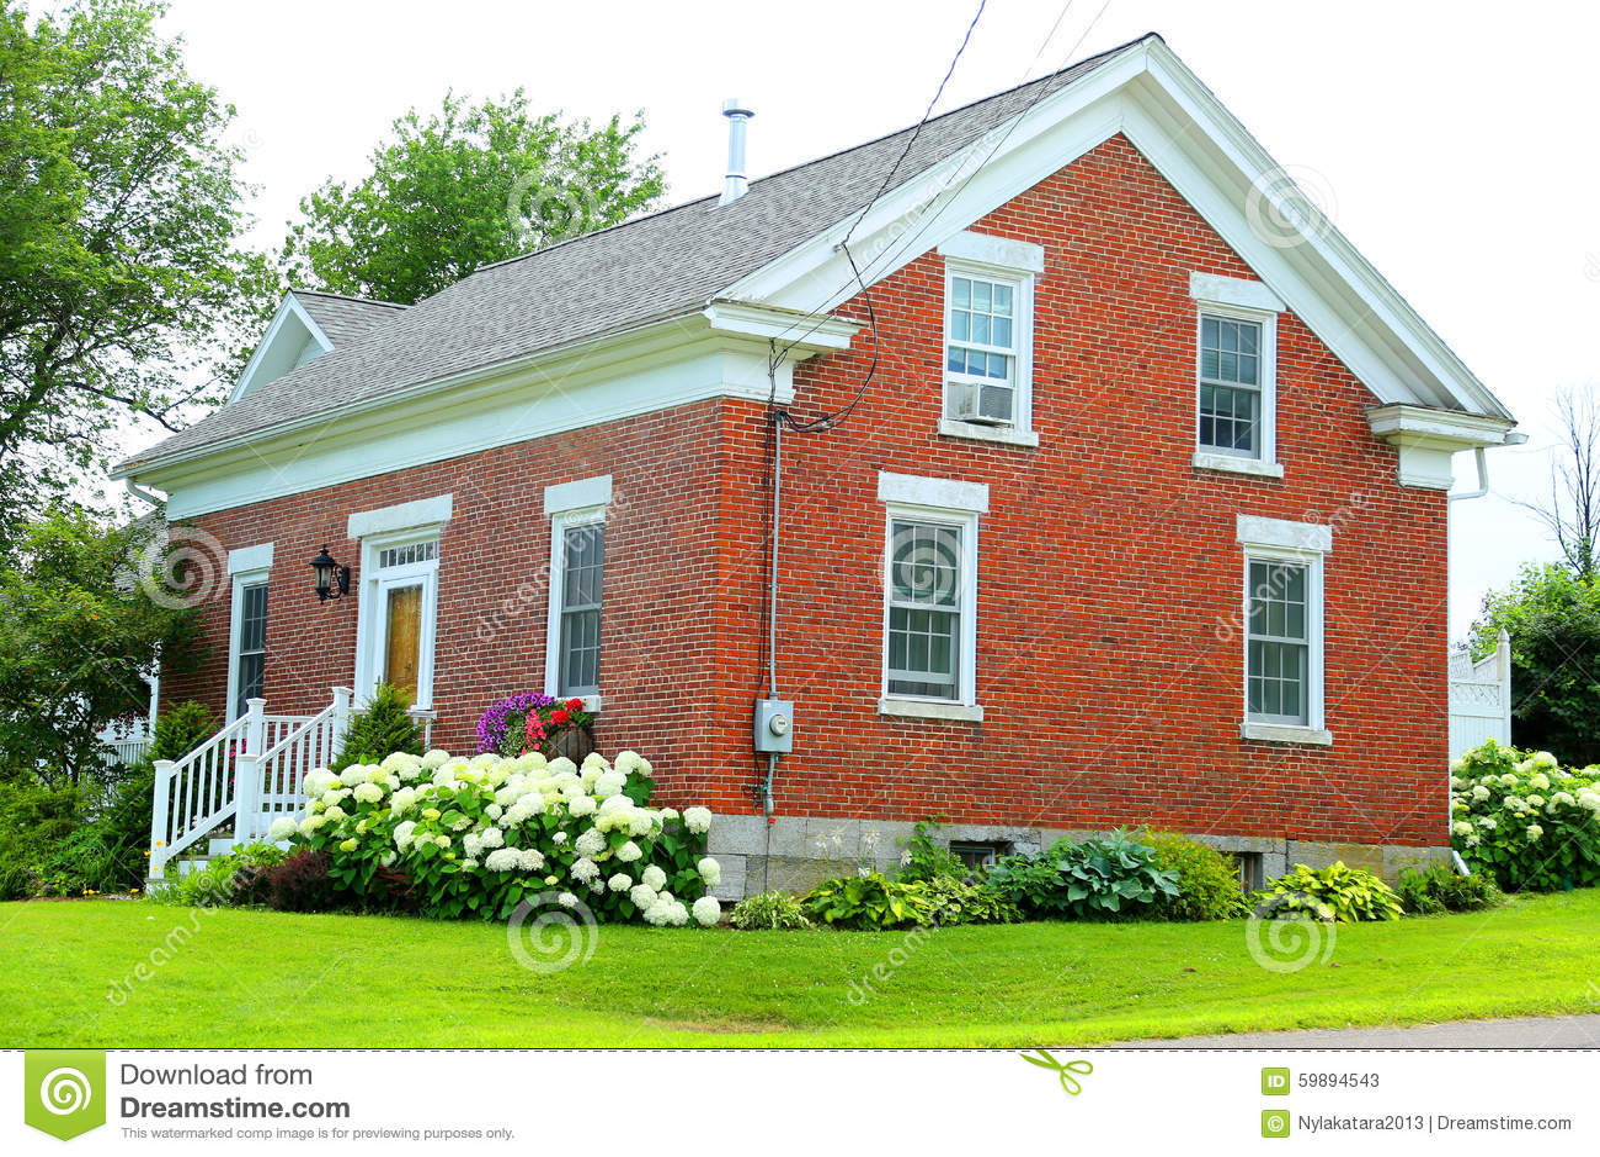 Red Brick House Stock Photo Image 59894543